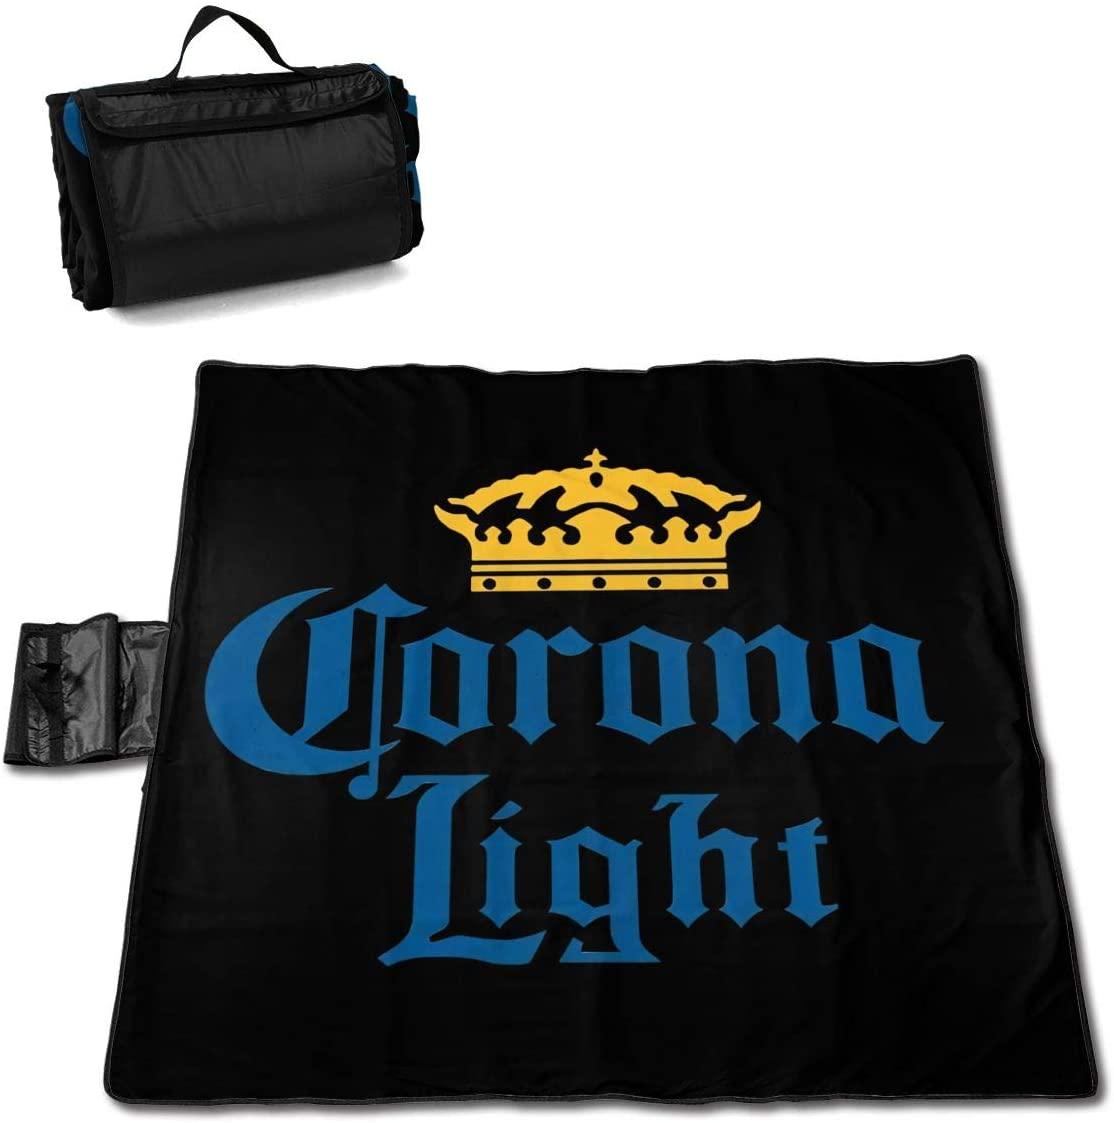 Zcm Corona Lights Portable Printed Picnic Blanket Waterproof 59x57(in)